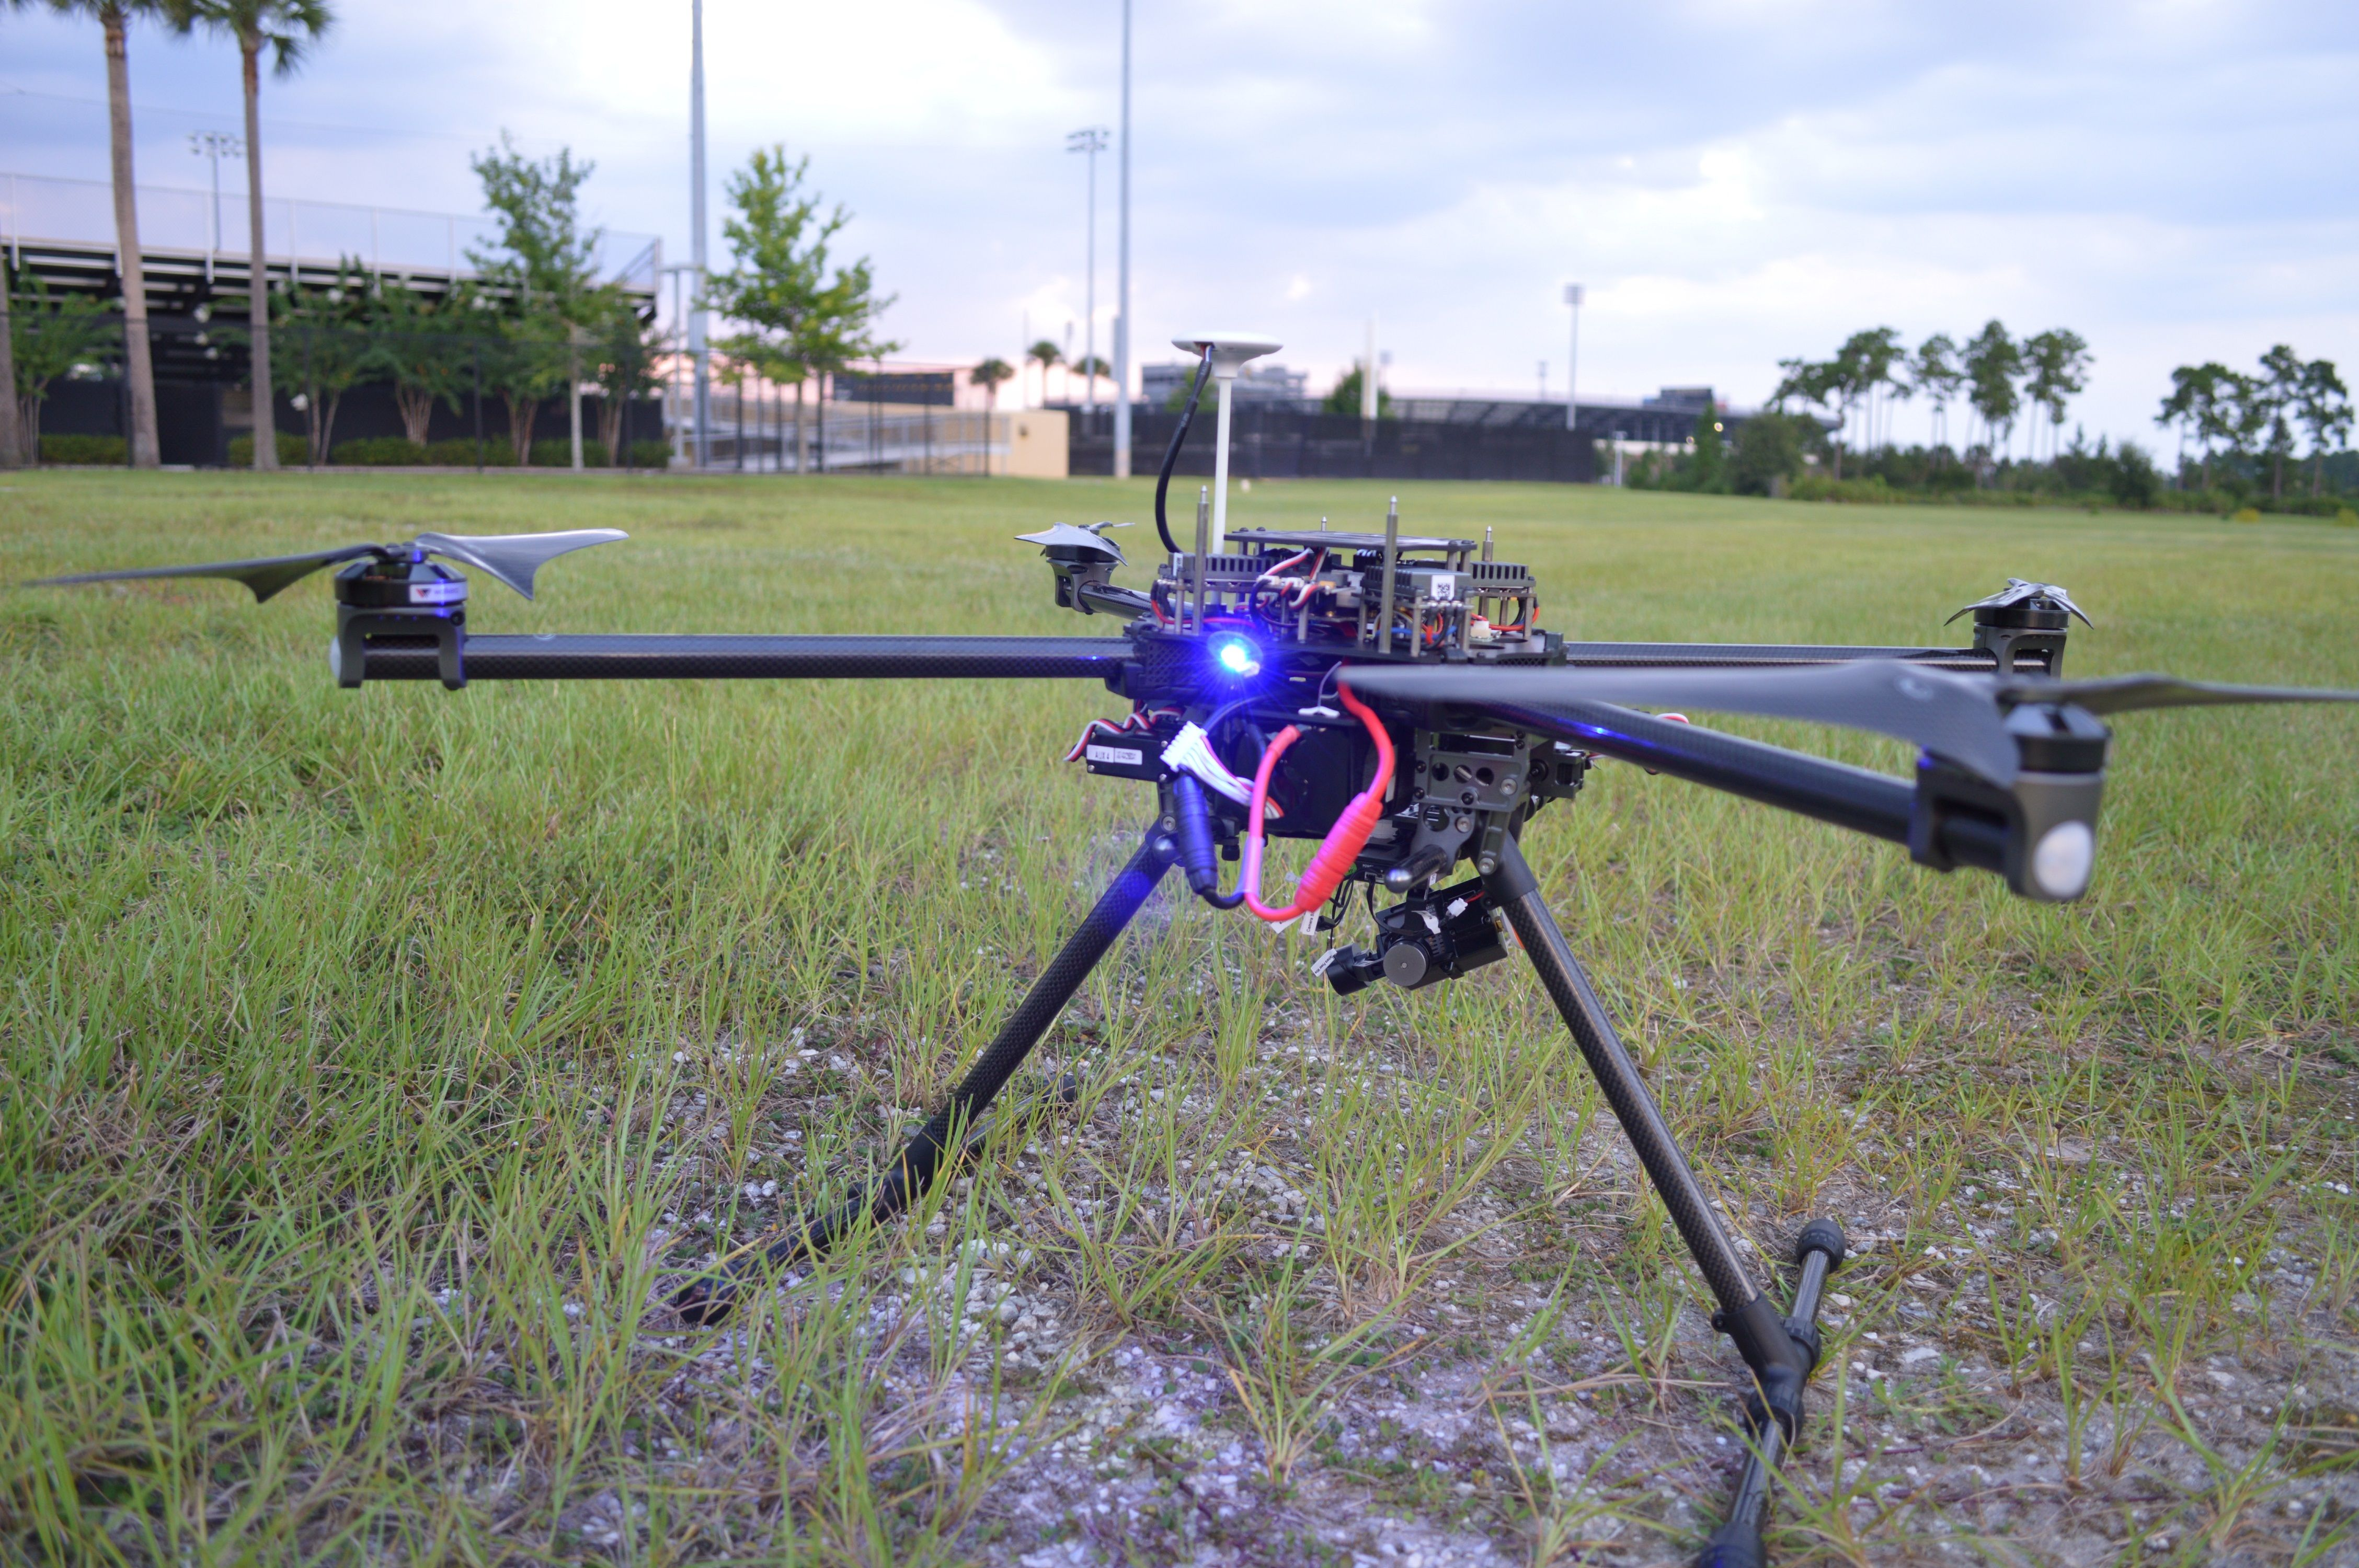 Walkera QR X800 GPS QuadCopter Drone! 30-60 minutes of flight time ...